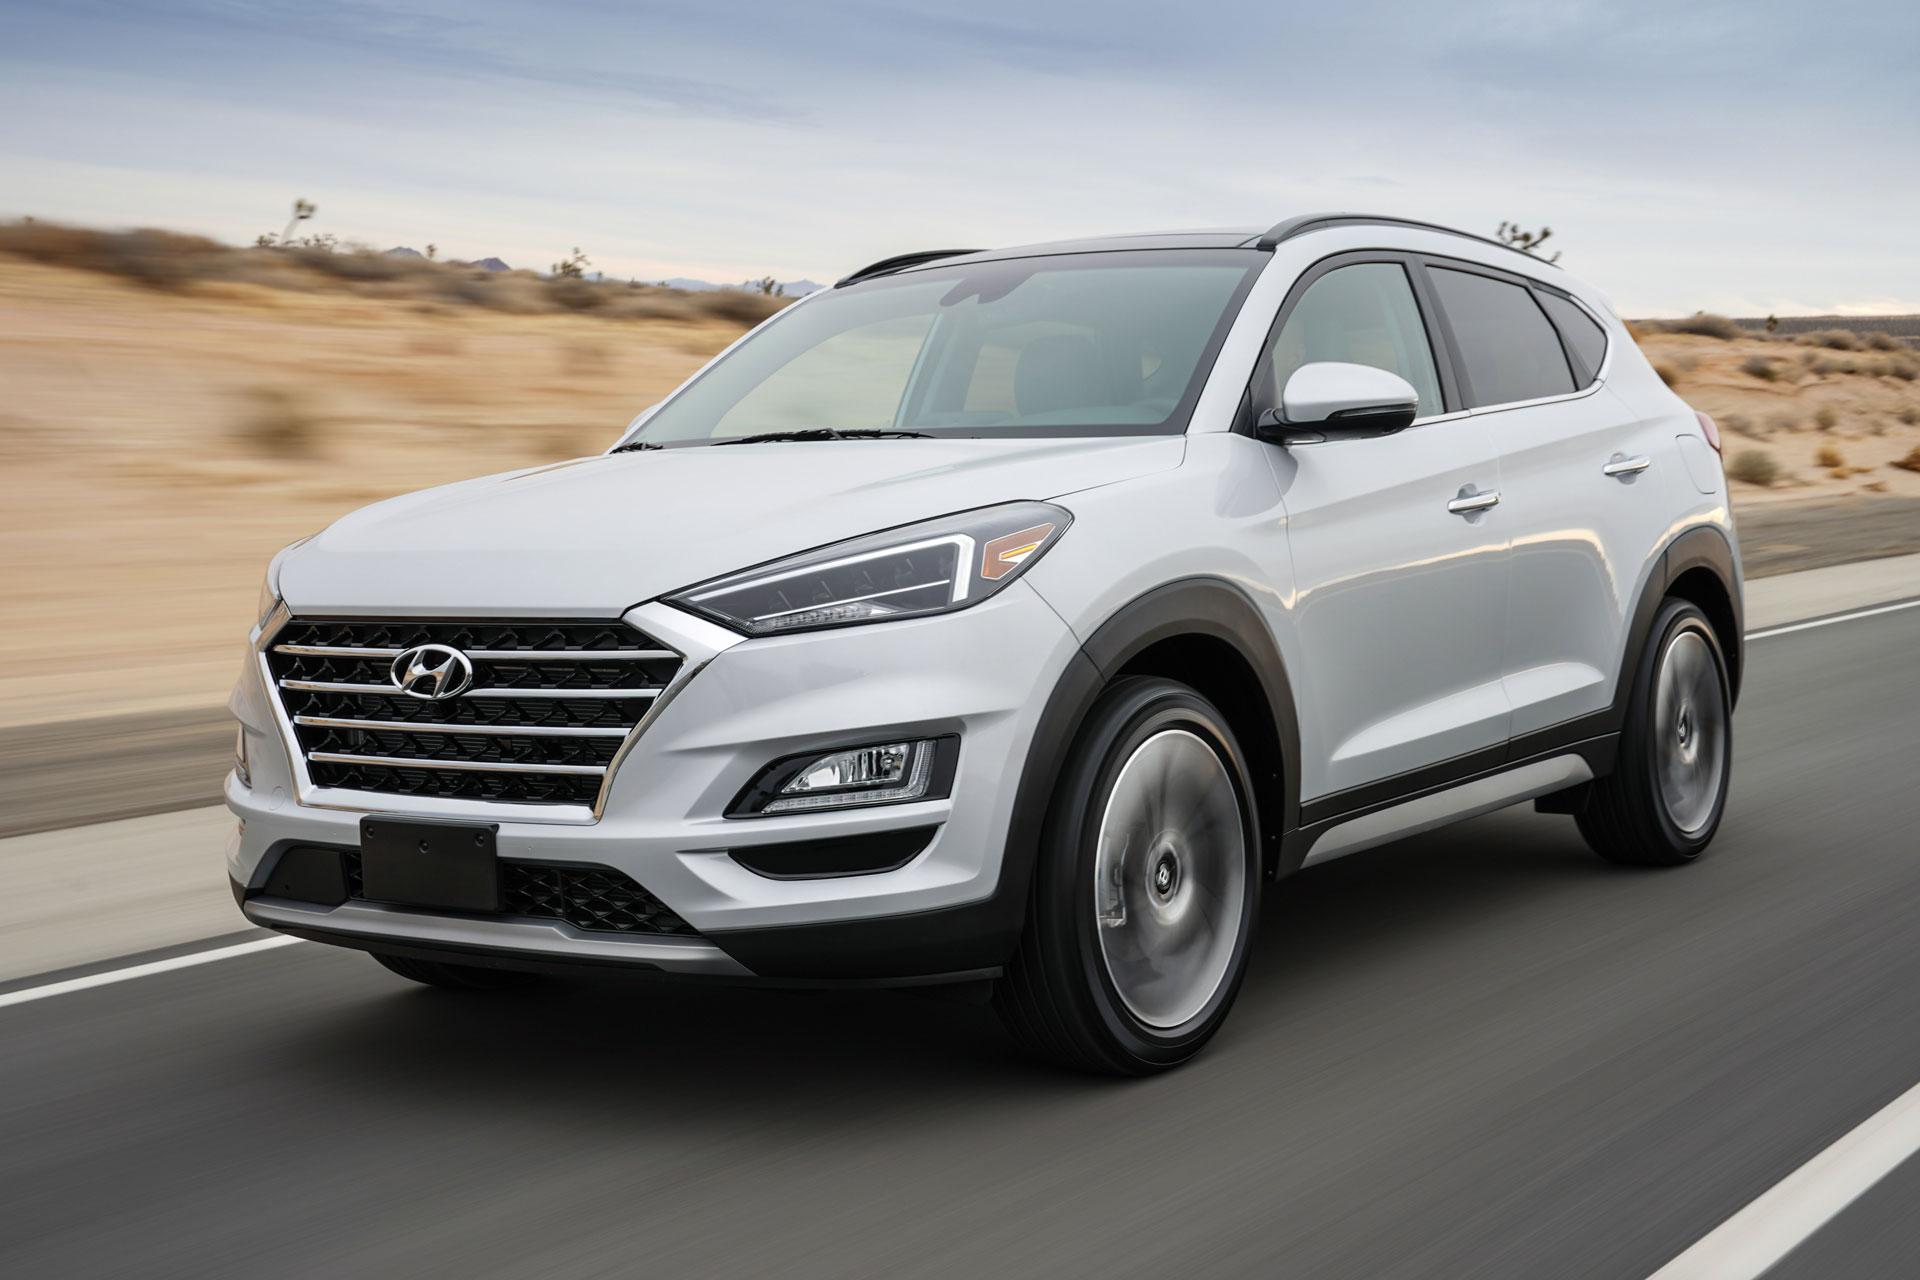 2019 Hyundai Tucson preview